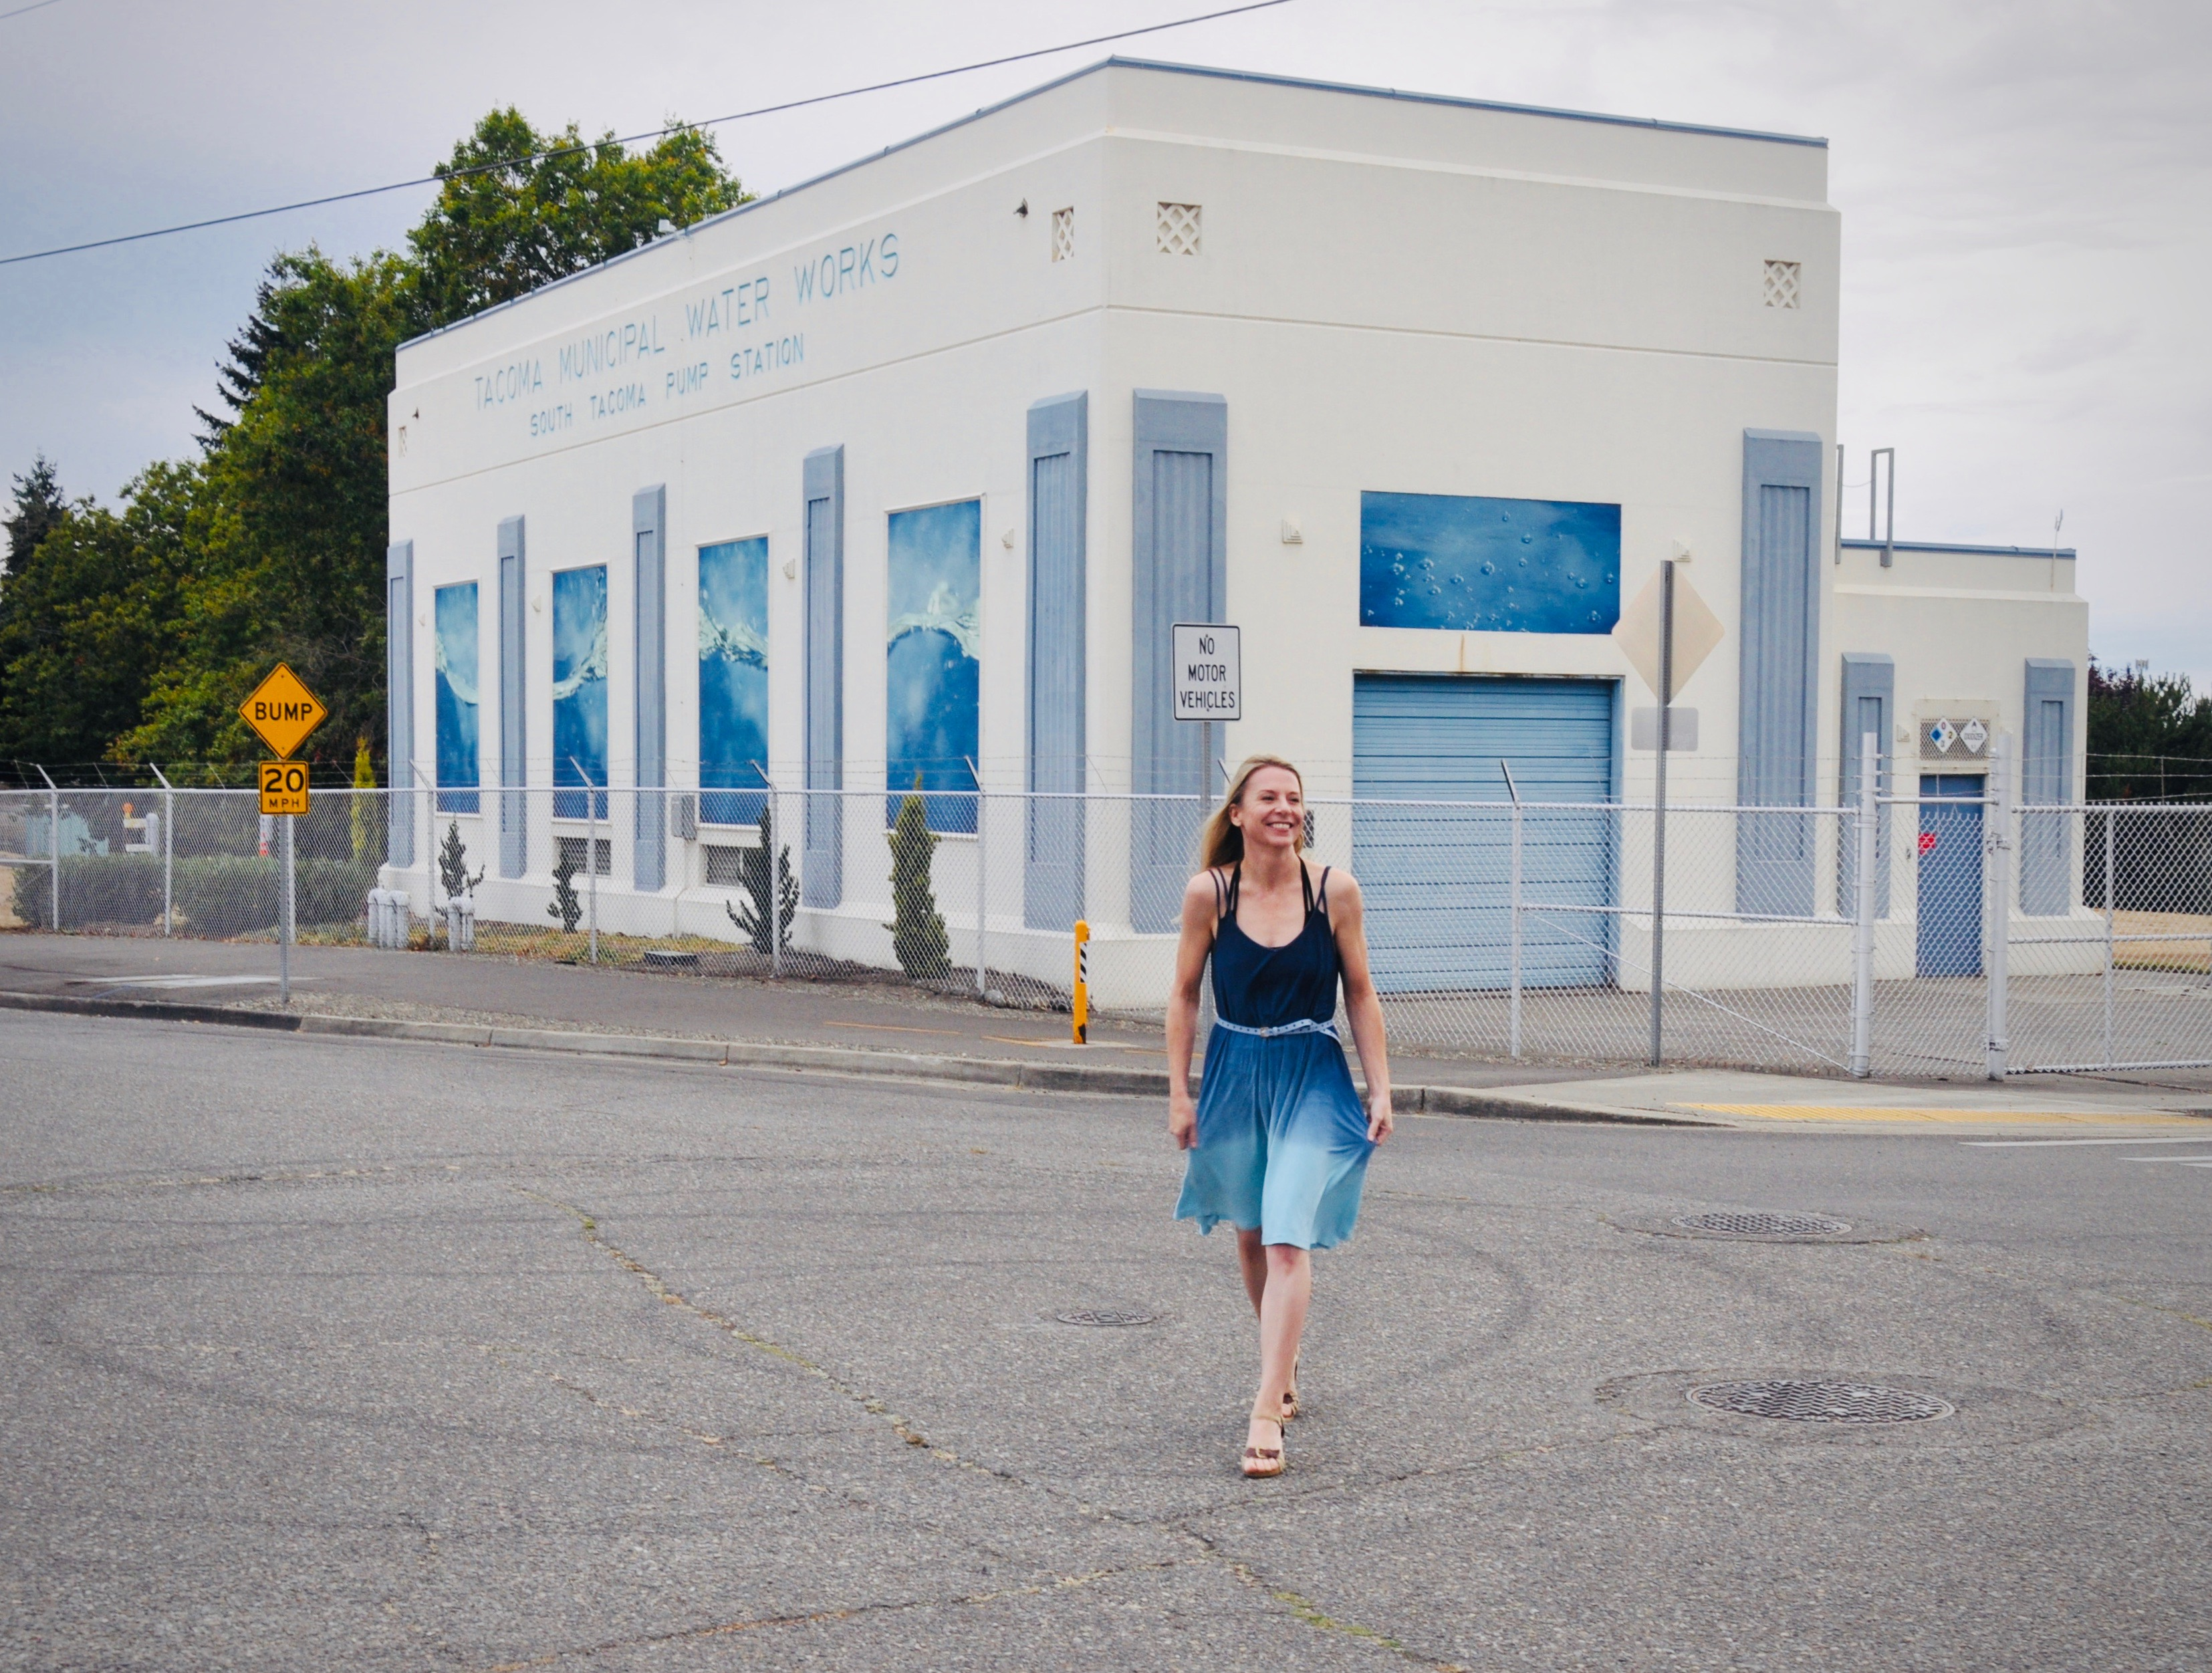 FLOW, Tacoma art installation collaboration with Washington State artists, Clark Wiegman and Jennife